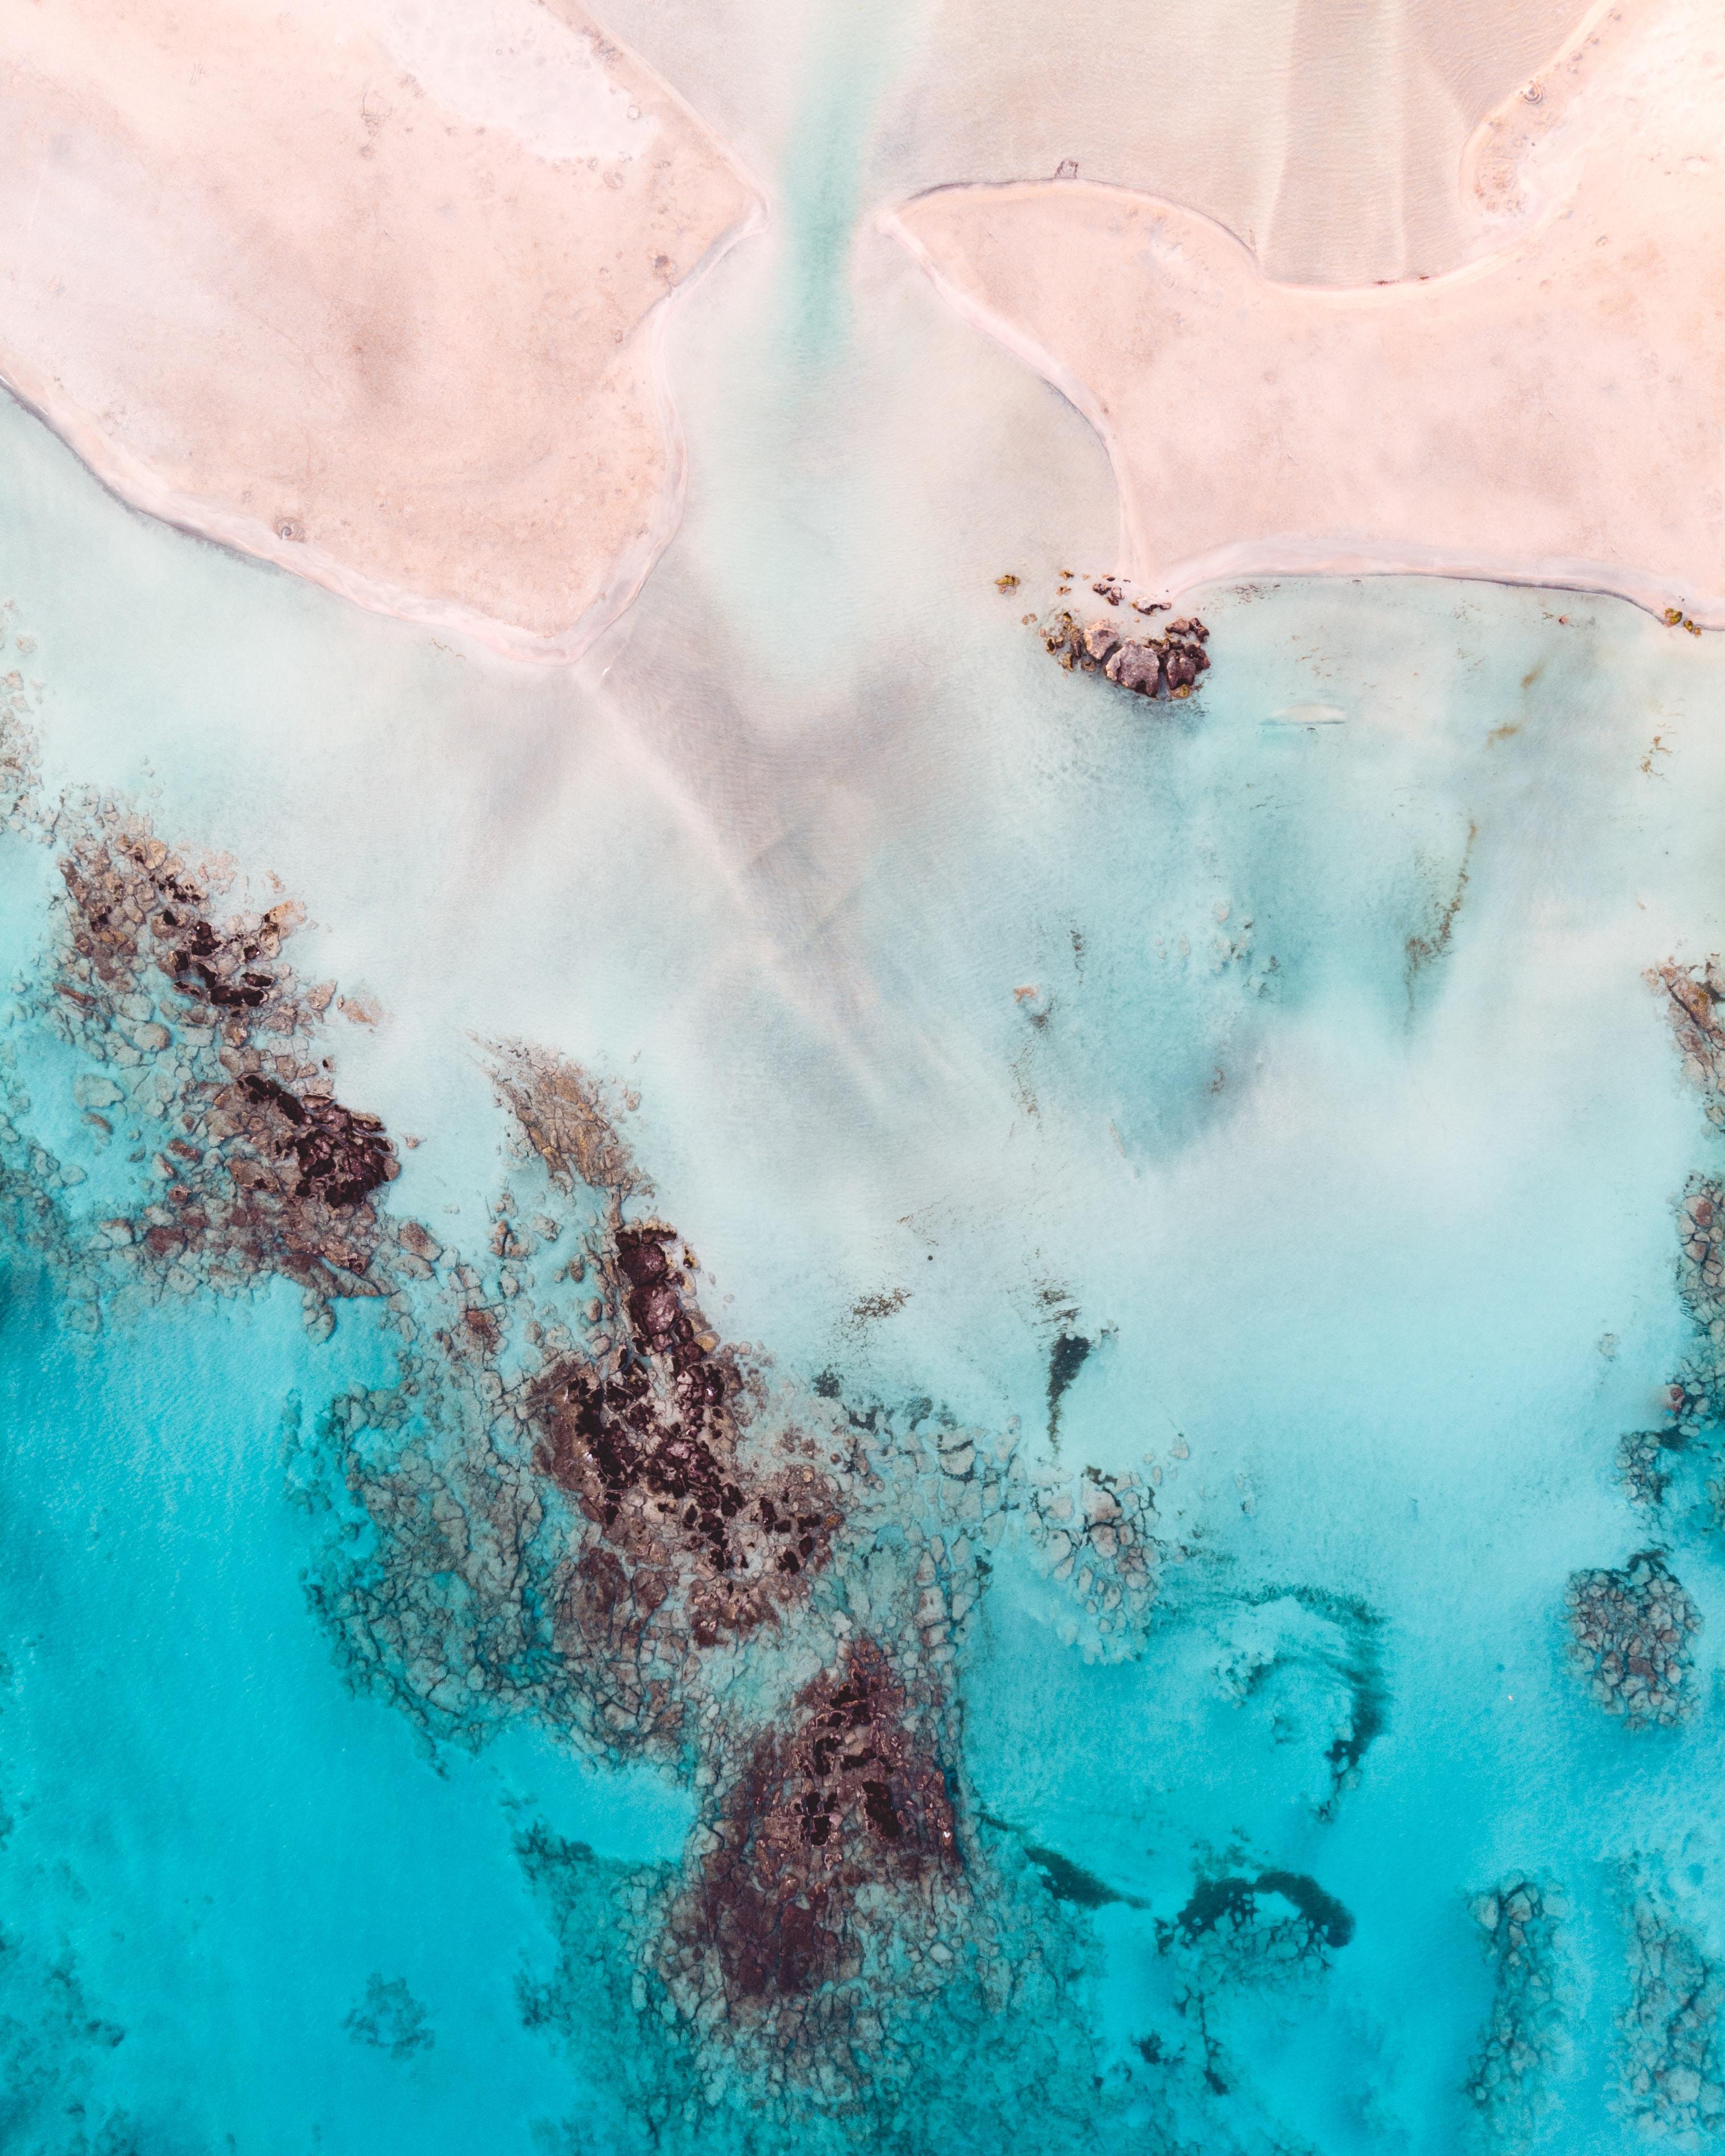 aerial photo of seashore during daytime